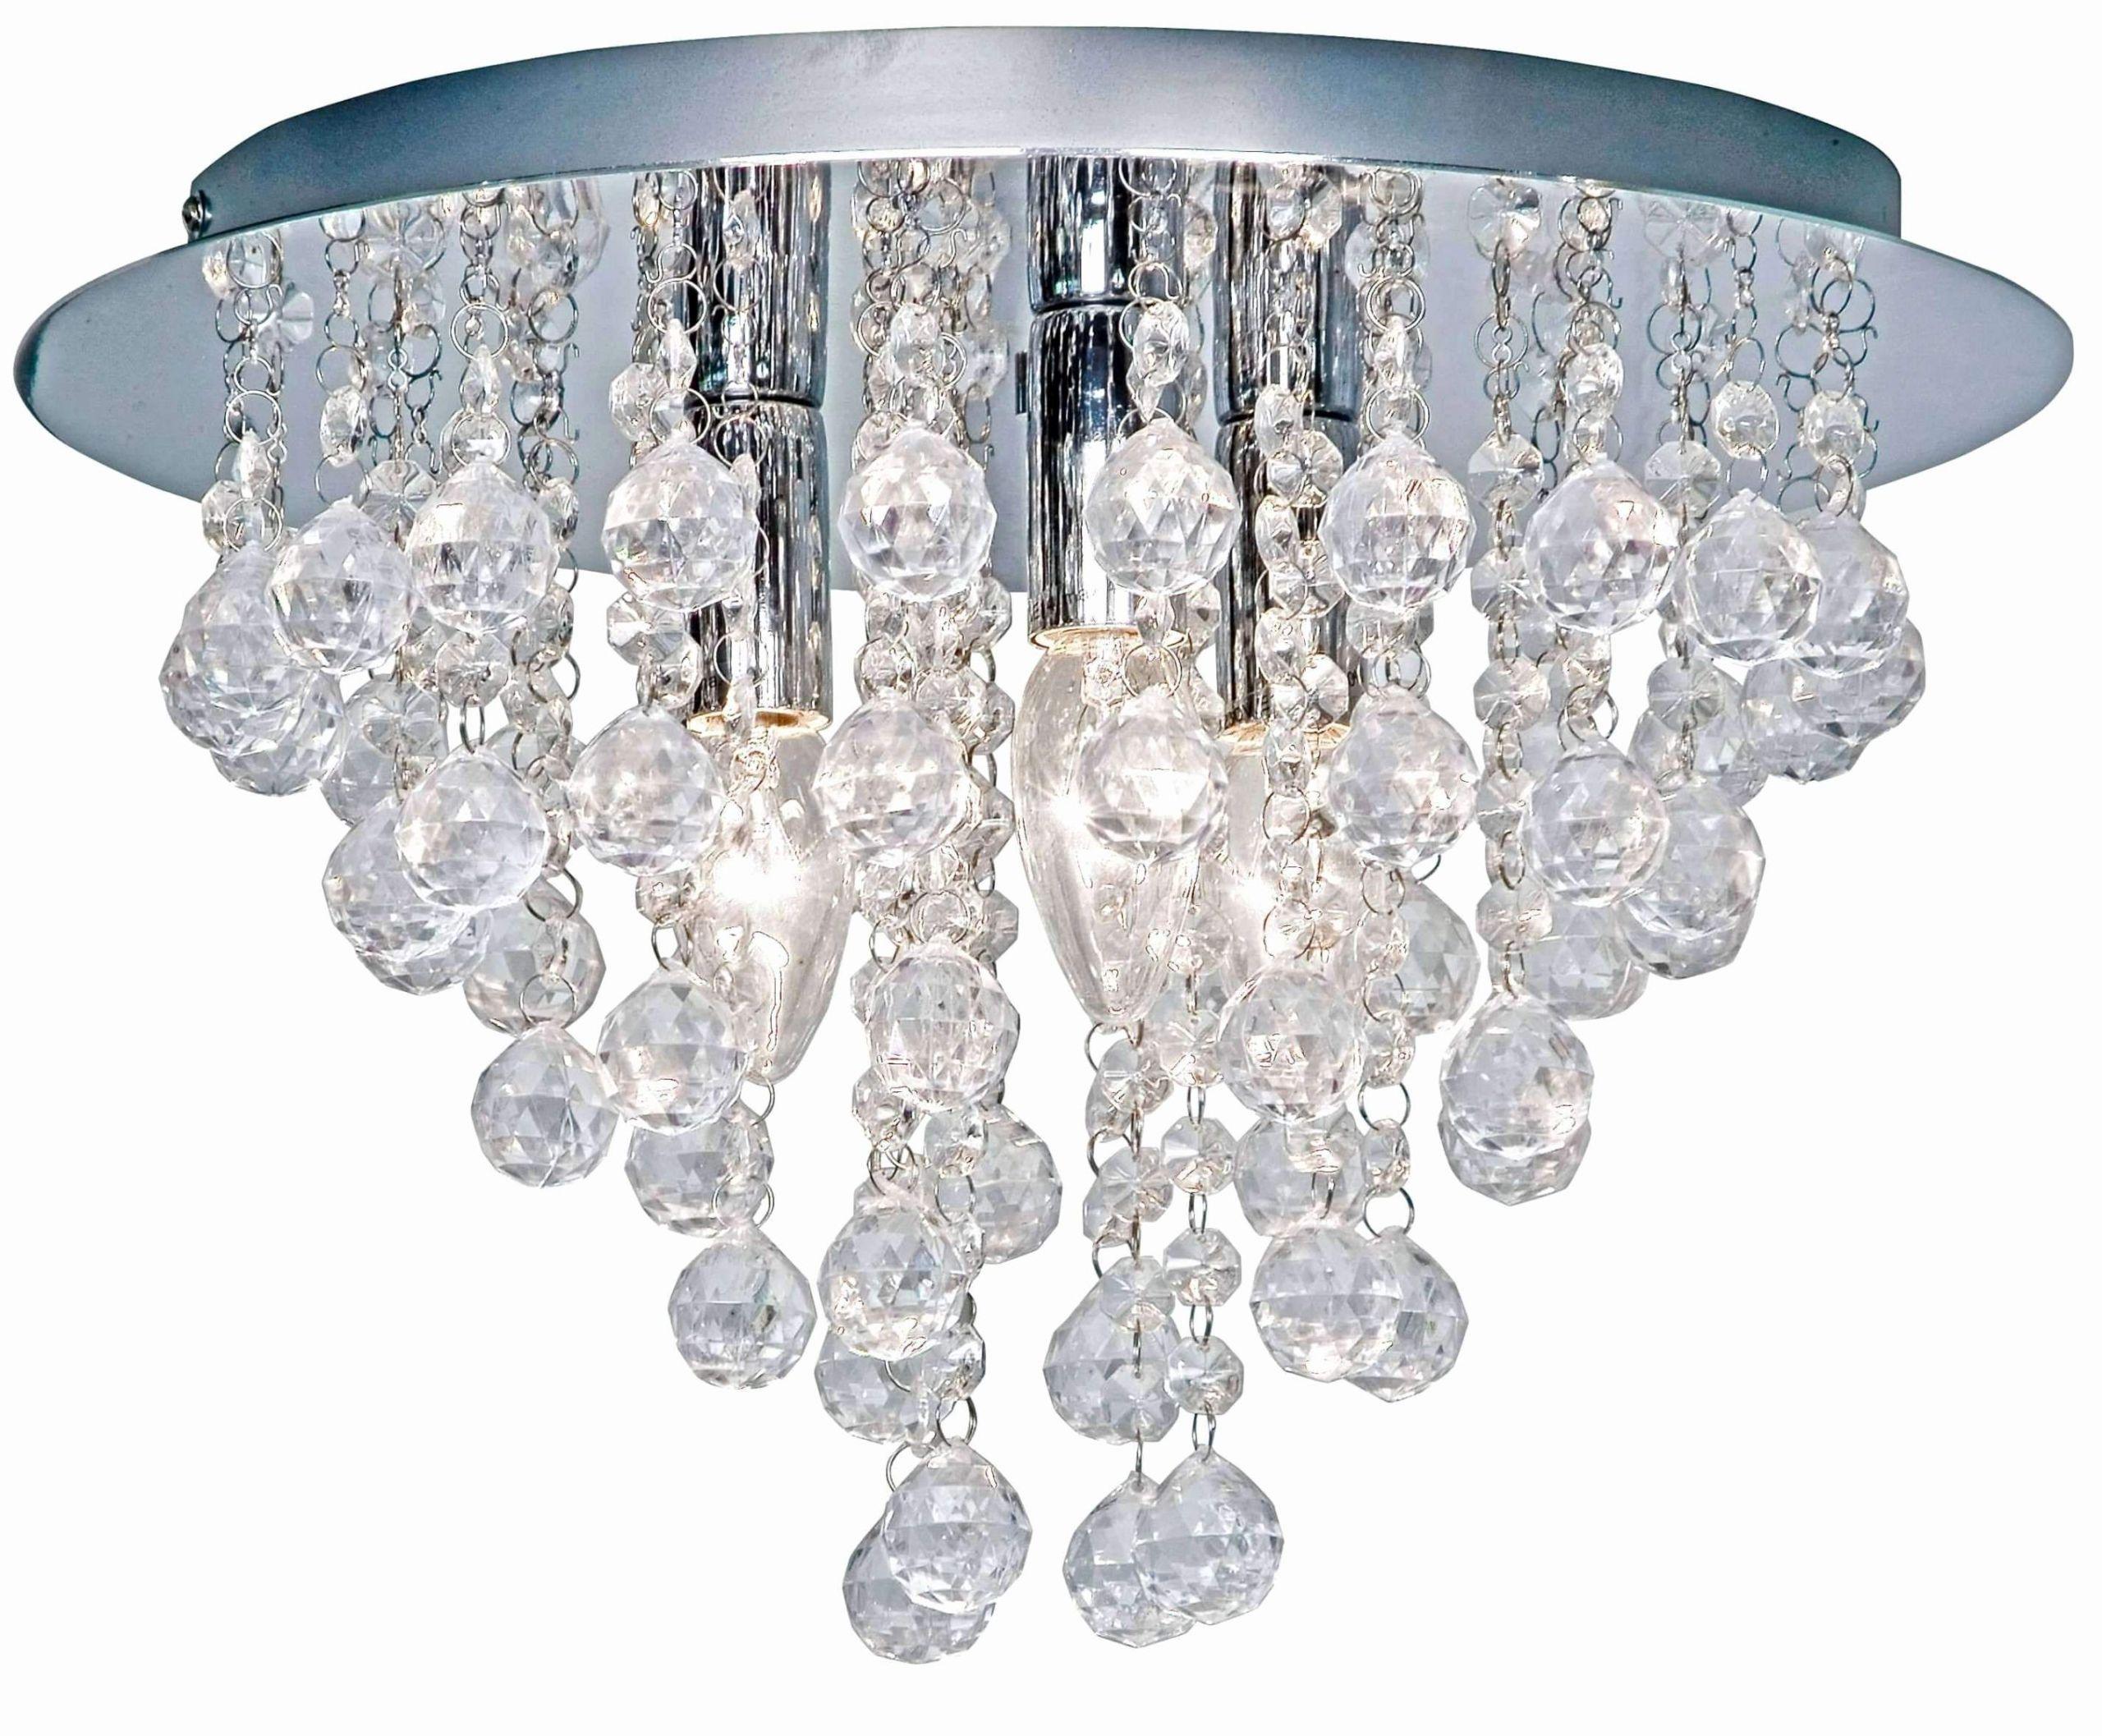 led stehlampe aldi einzigartig led lampe badezimmer schon deckenlampe schlafzimmer 0d archives of led stehlampe aldi